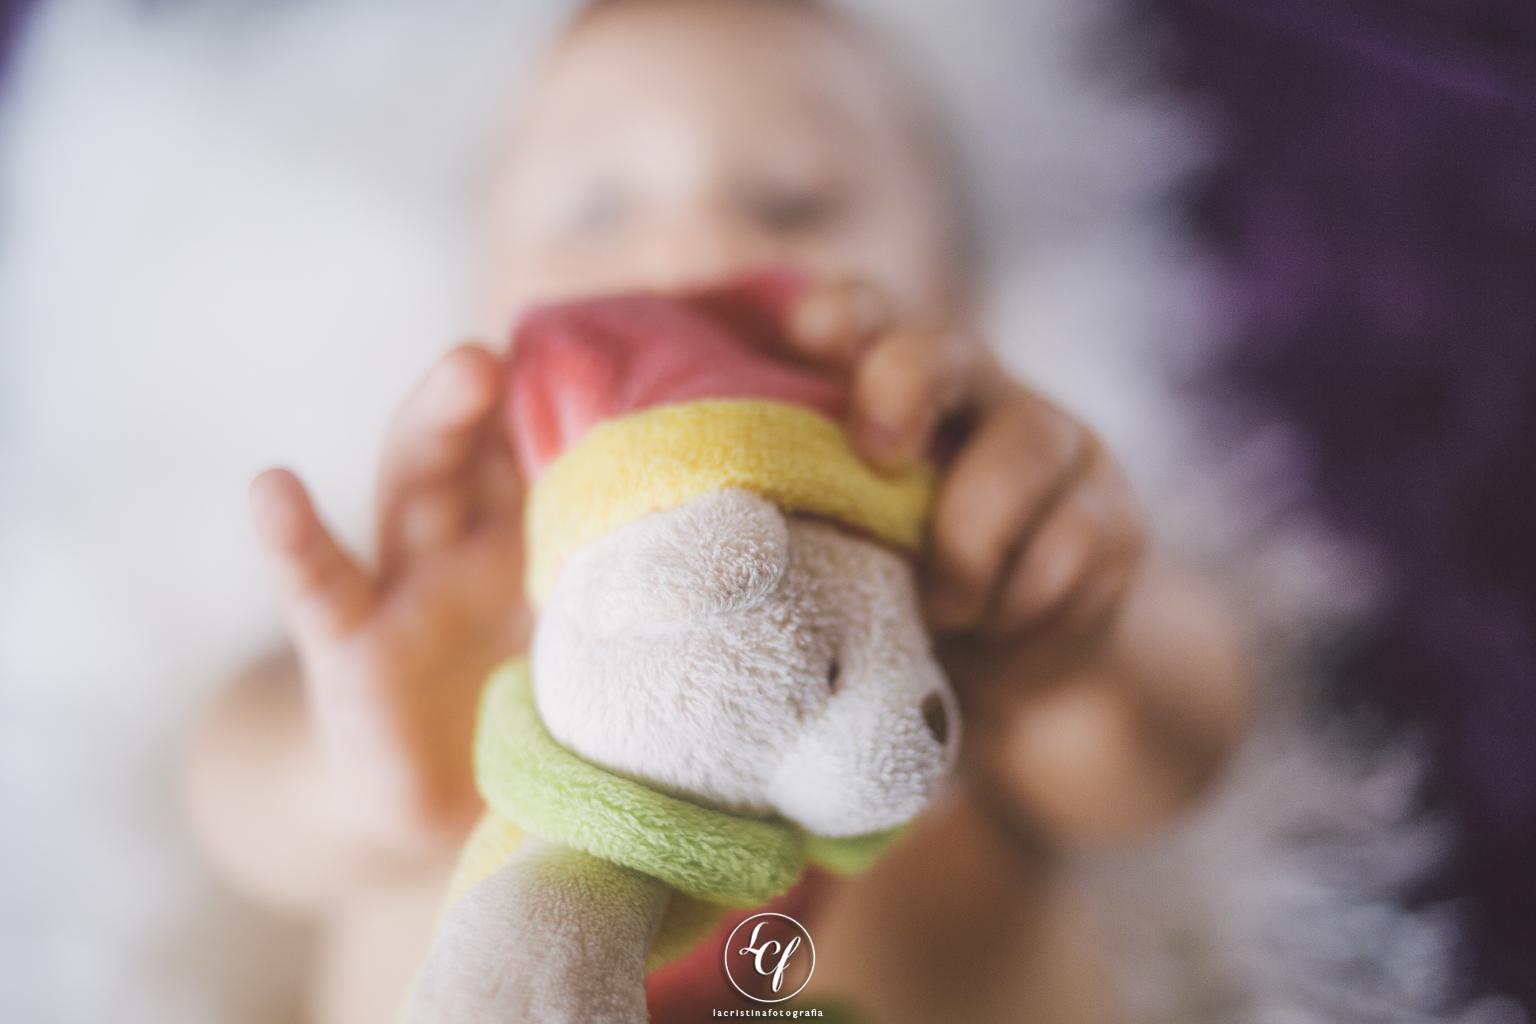 fotógrafo de bebés barcelona :: fotografía de bebés :: fotógrafo de reciés nacido barcelona